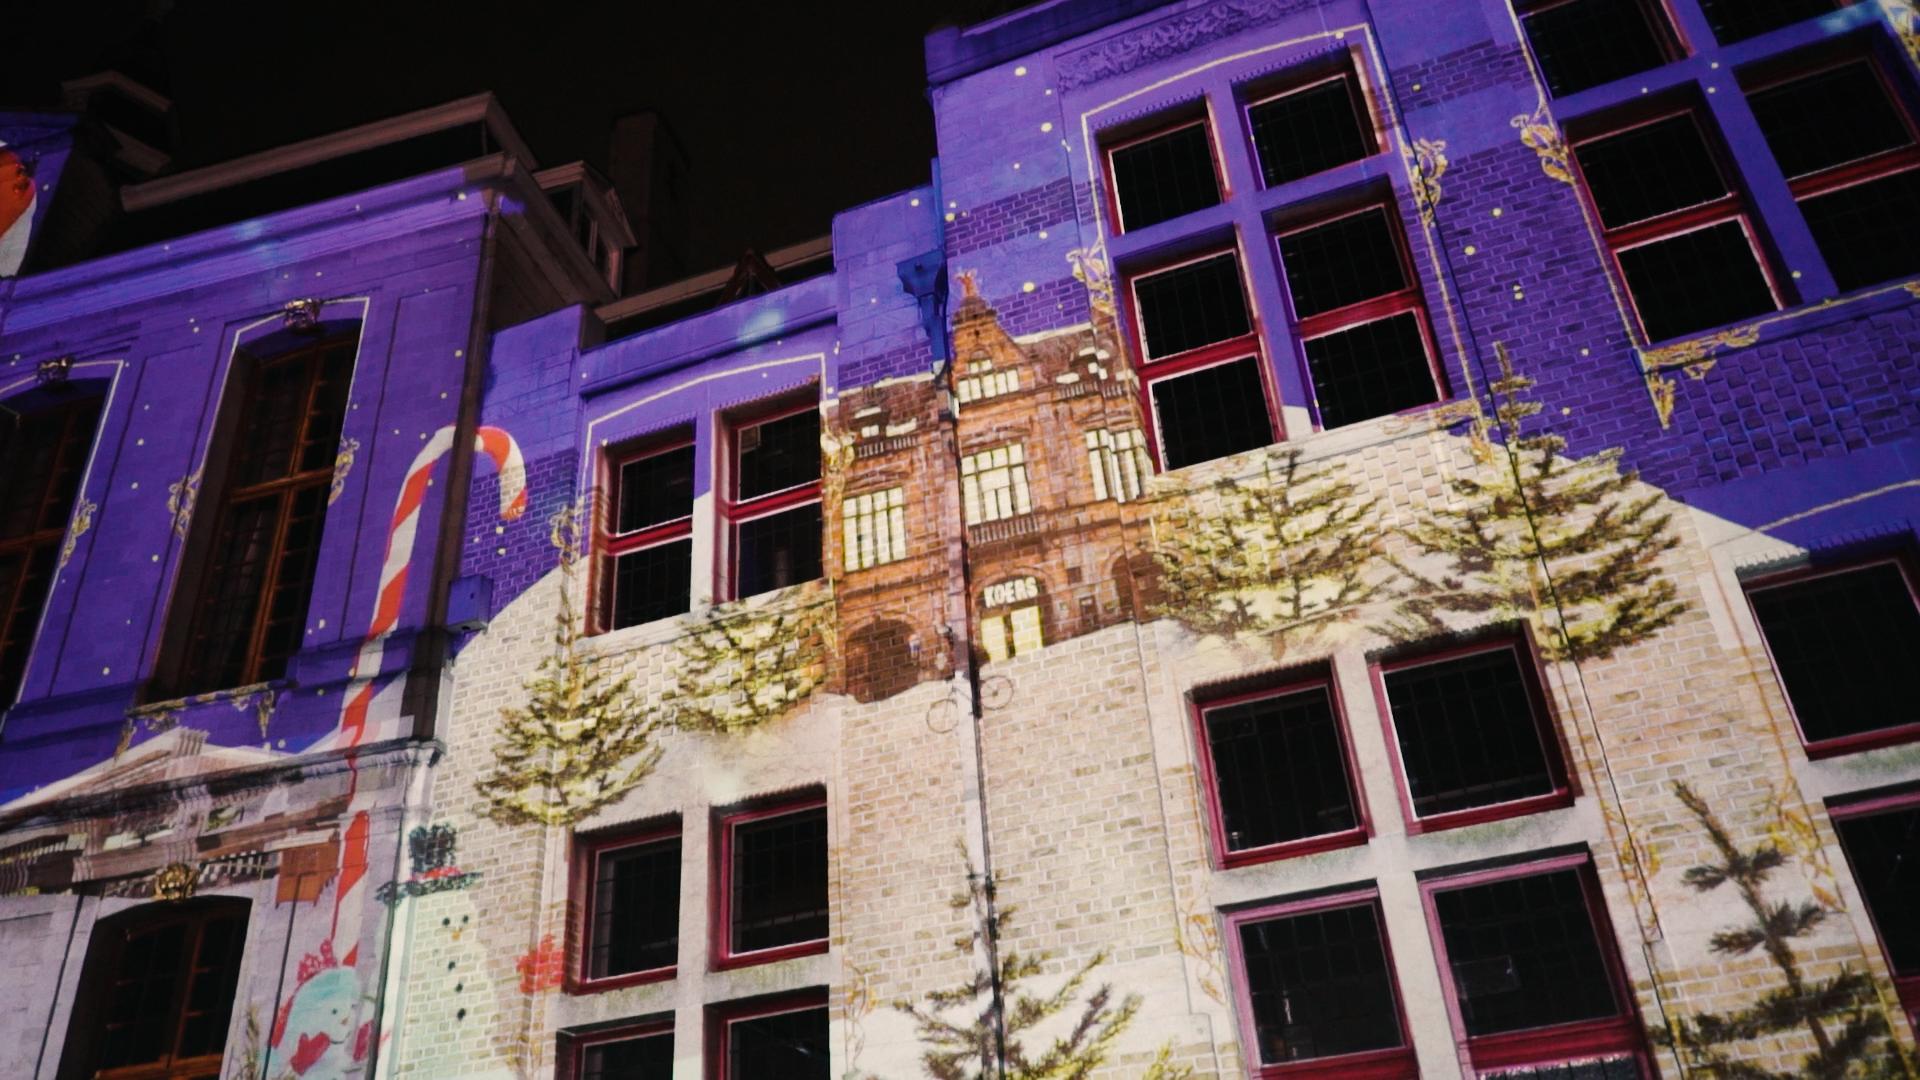 Kerstprojectie - kerst videomapping Roeselare Stadhuis en stadshal